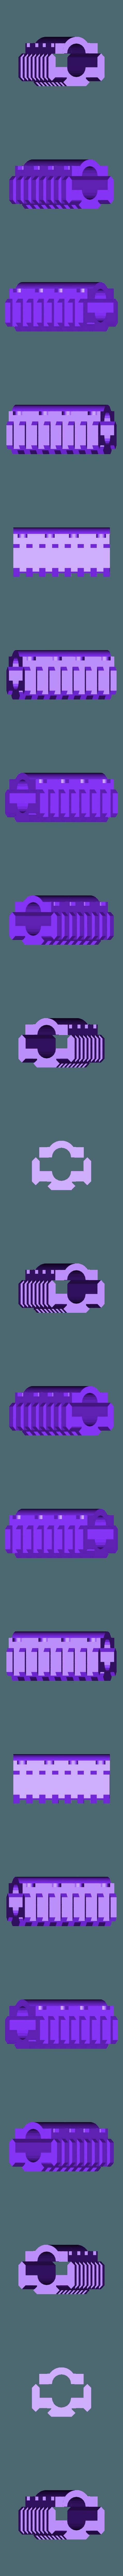 triple_weaver_rail_75mm.stl Download free STL file Triple Weaver Rail with Silencer Dummy • 3D printable model, vmi